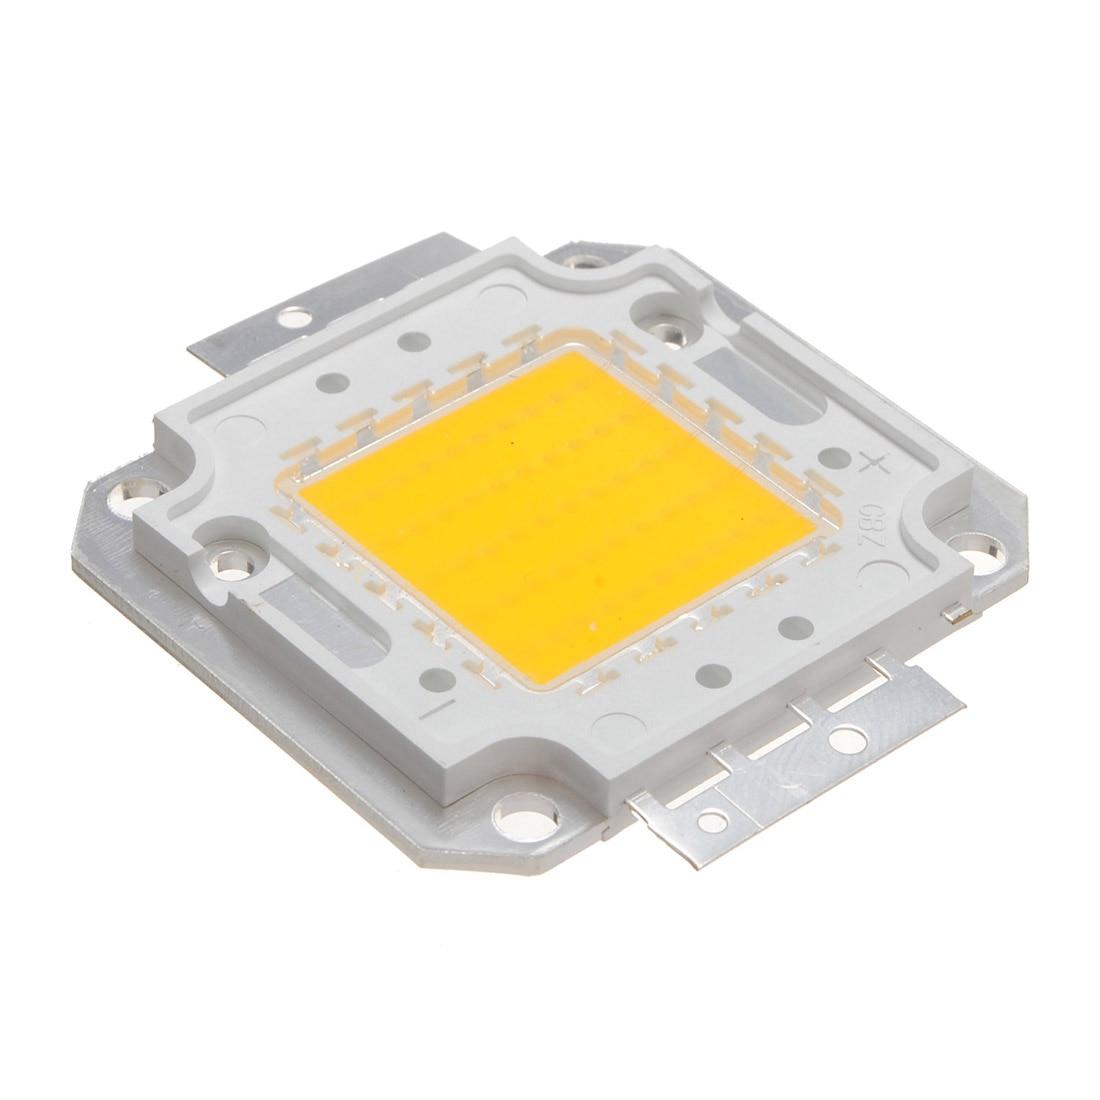 Hot Sale High Power 50W 4000LM Super Bright COB Spot LED Lamp Chips Light Bulb Pure/Warm White 2 Colors